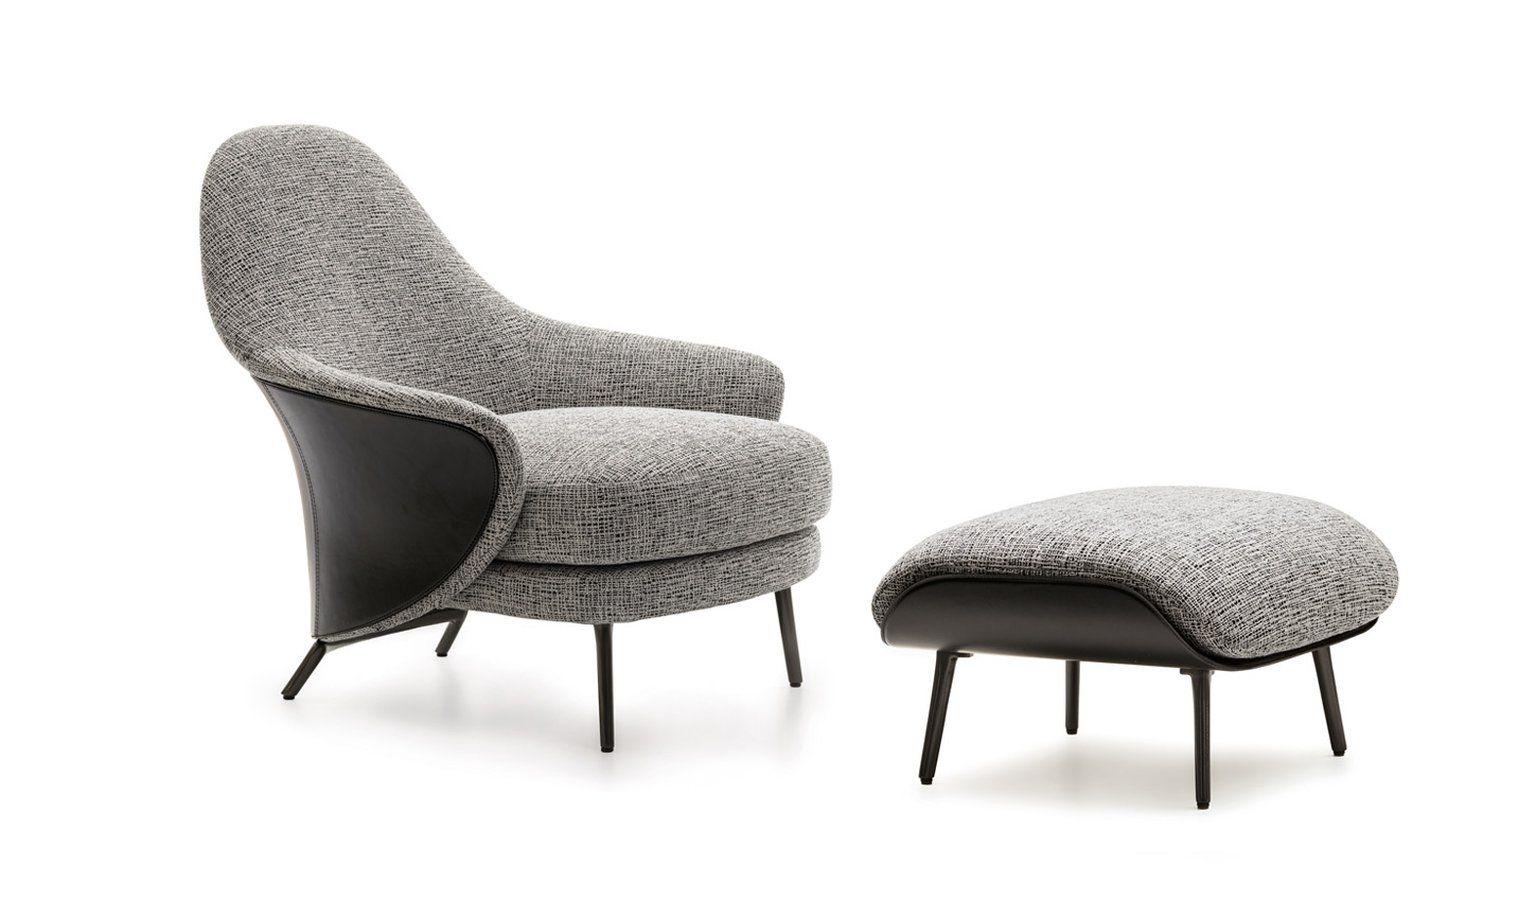 Angie Armchair By Minotti Ecc Furniture Armchair Chair